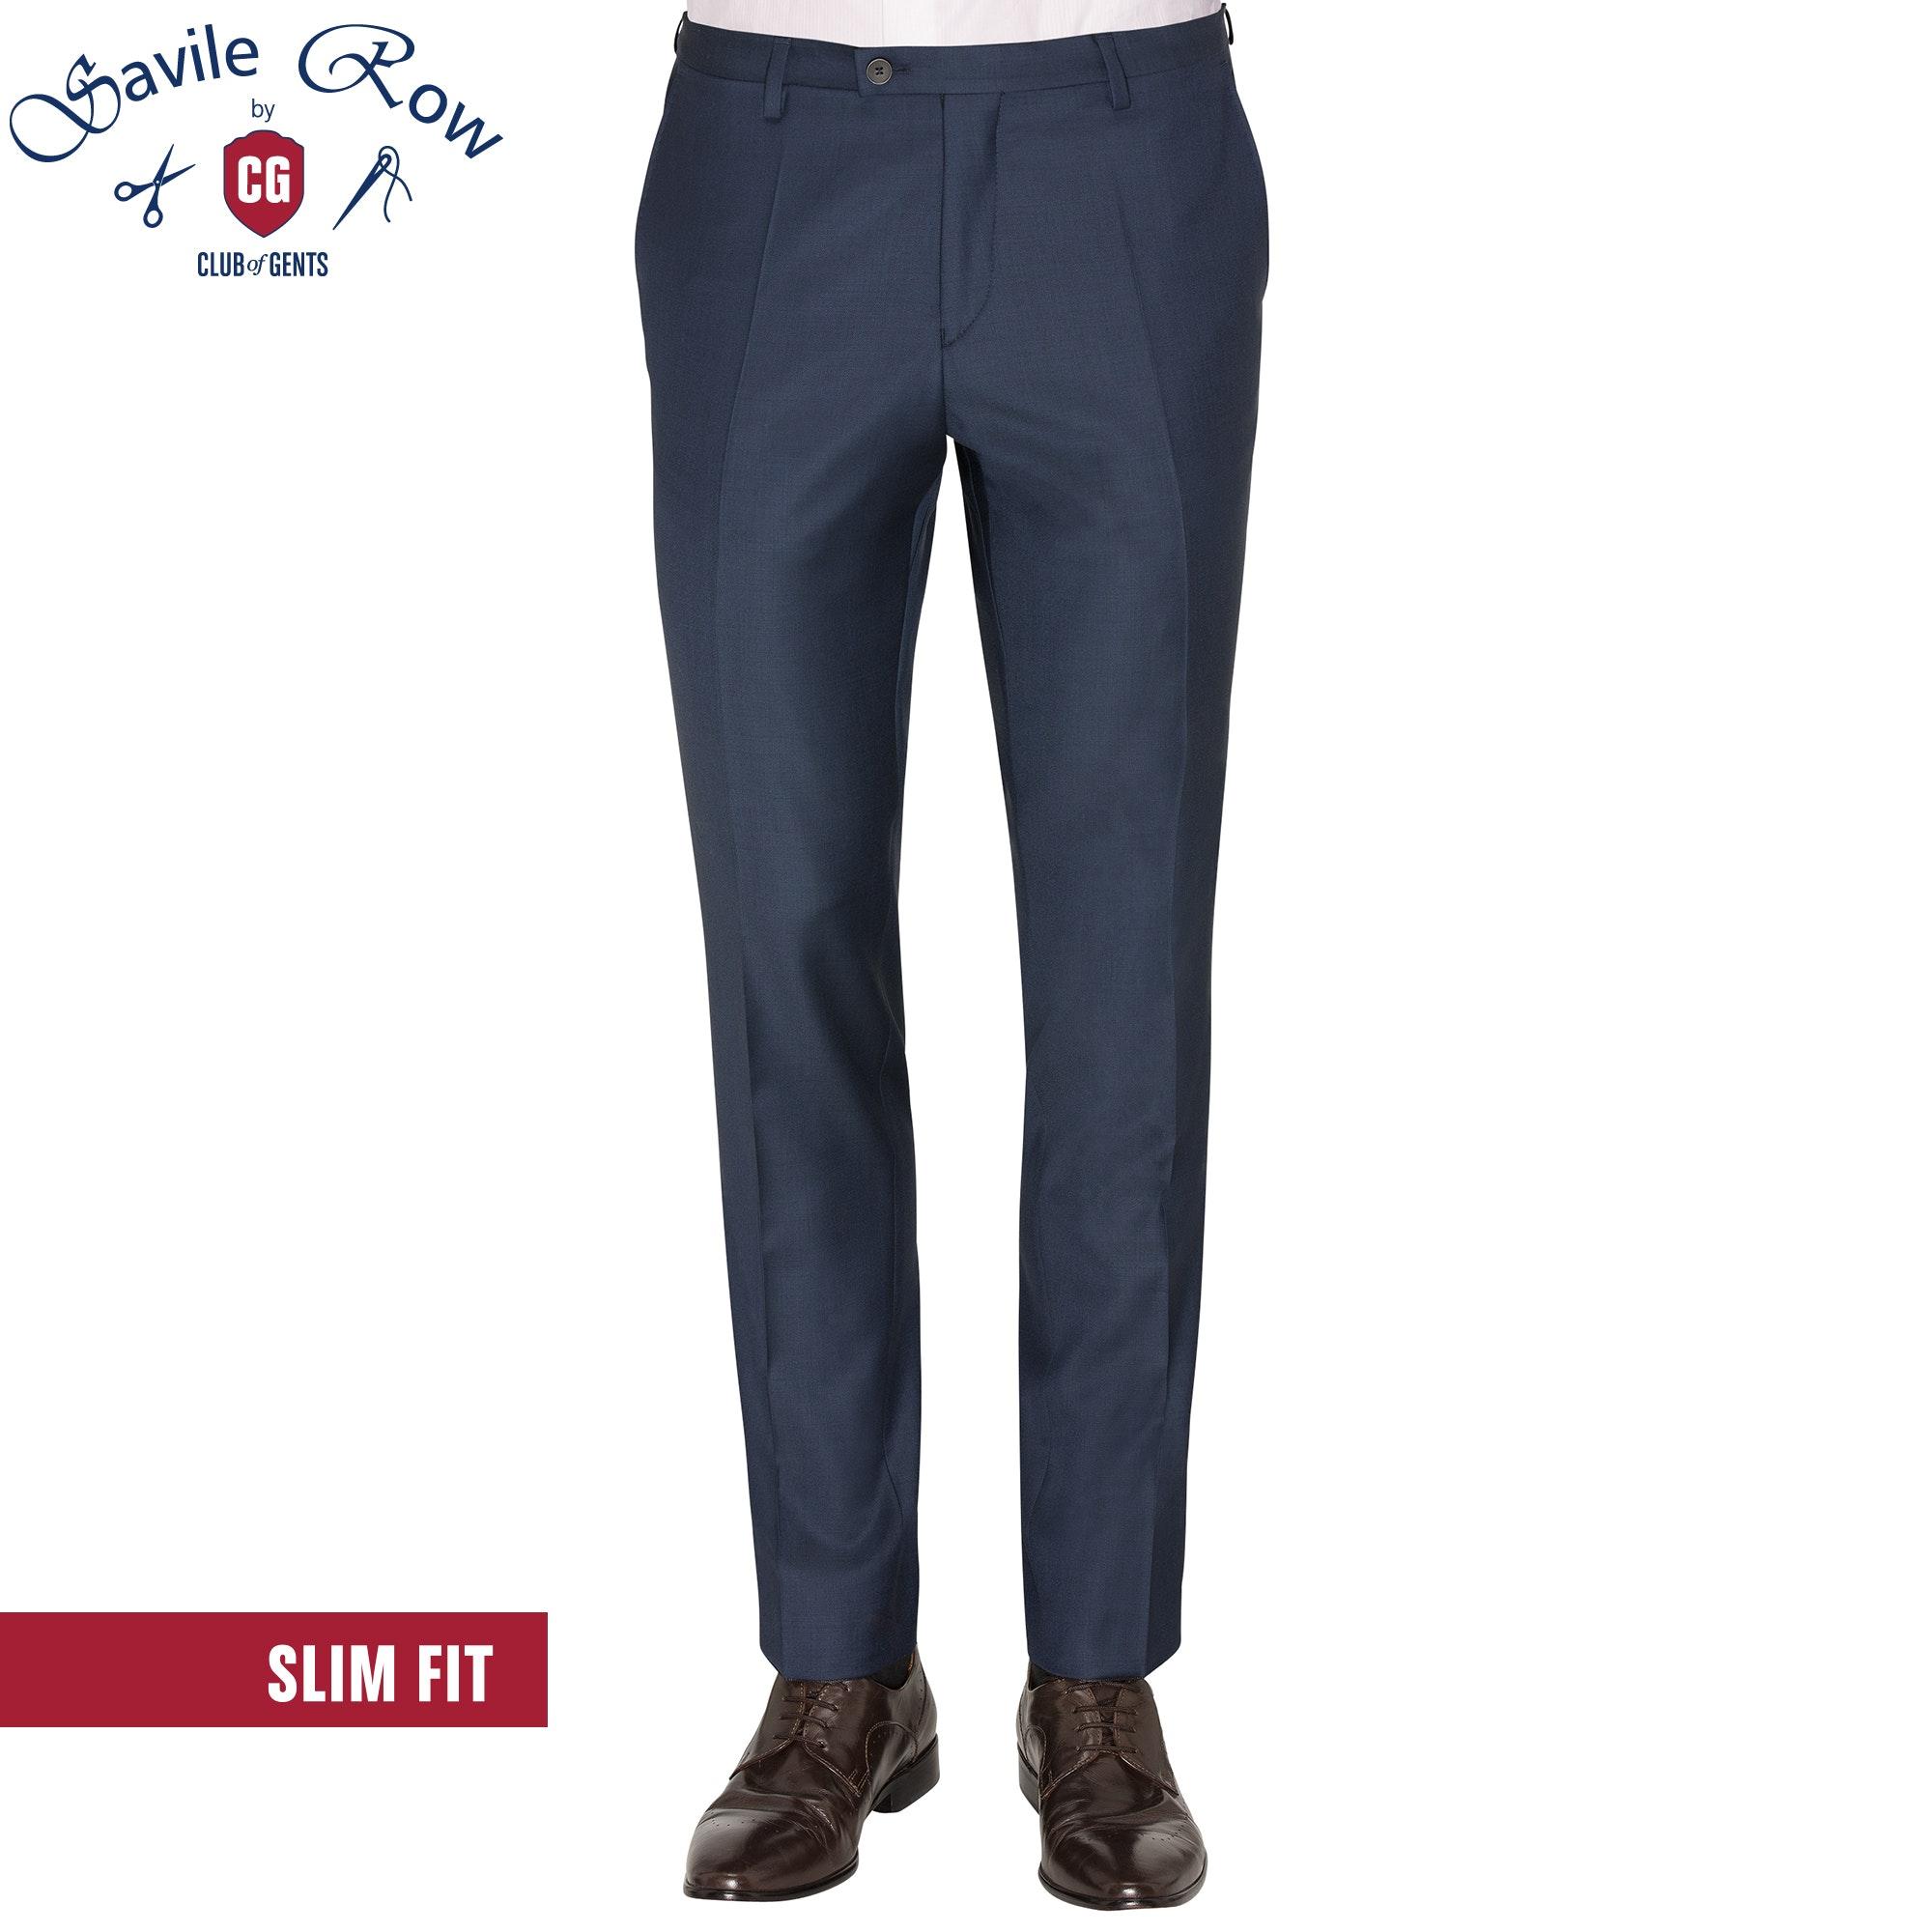 Hose/Trousers CG Chaz